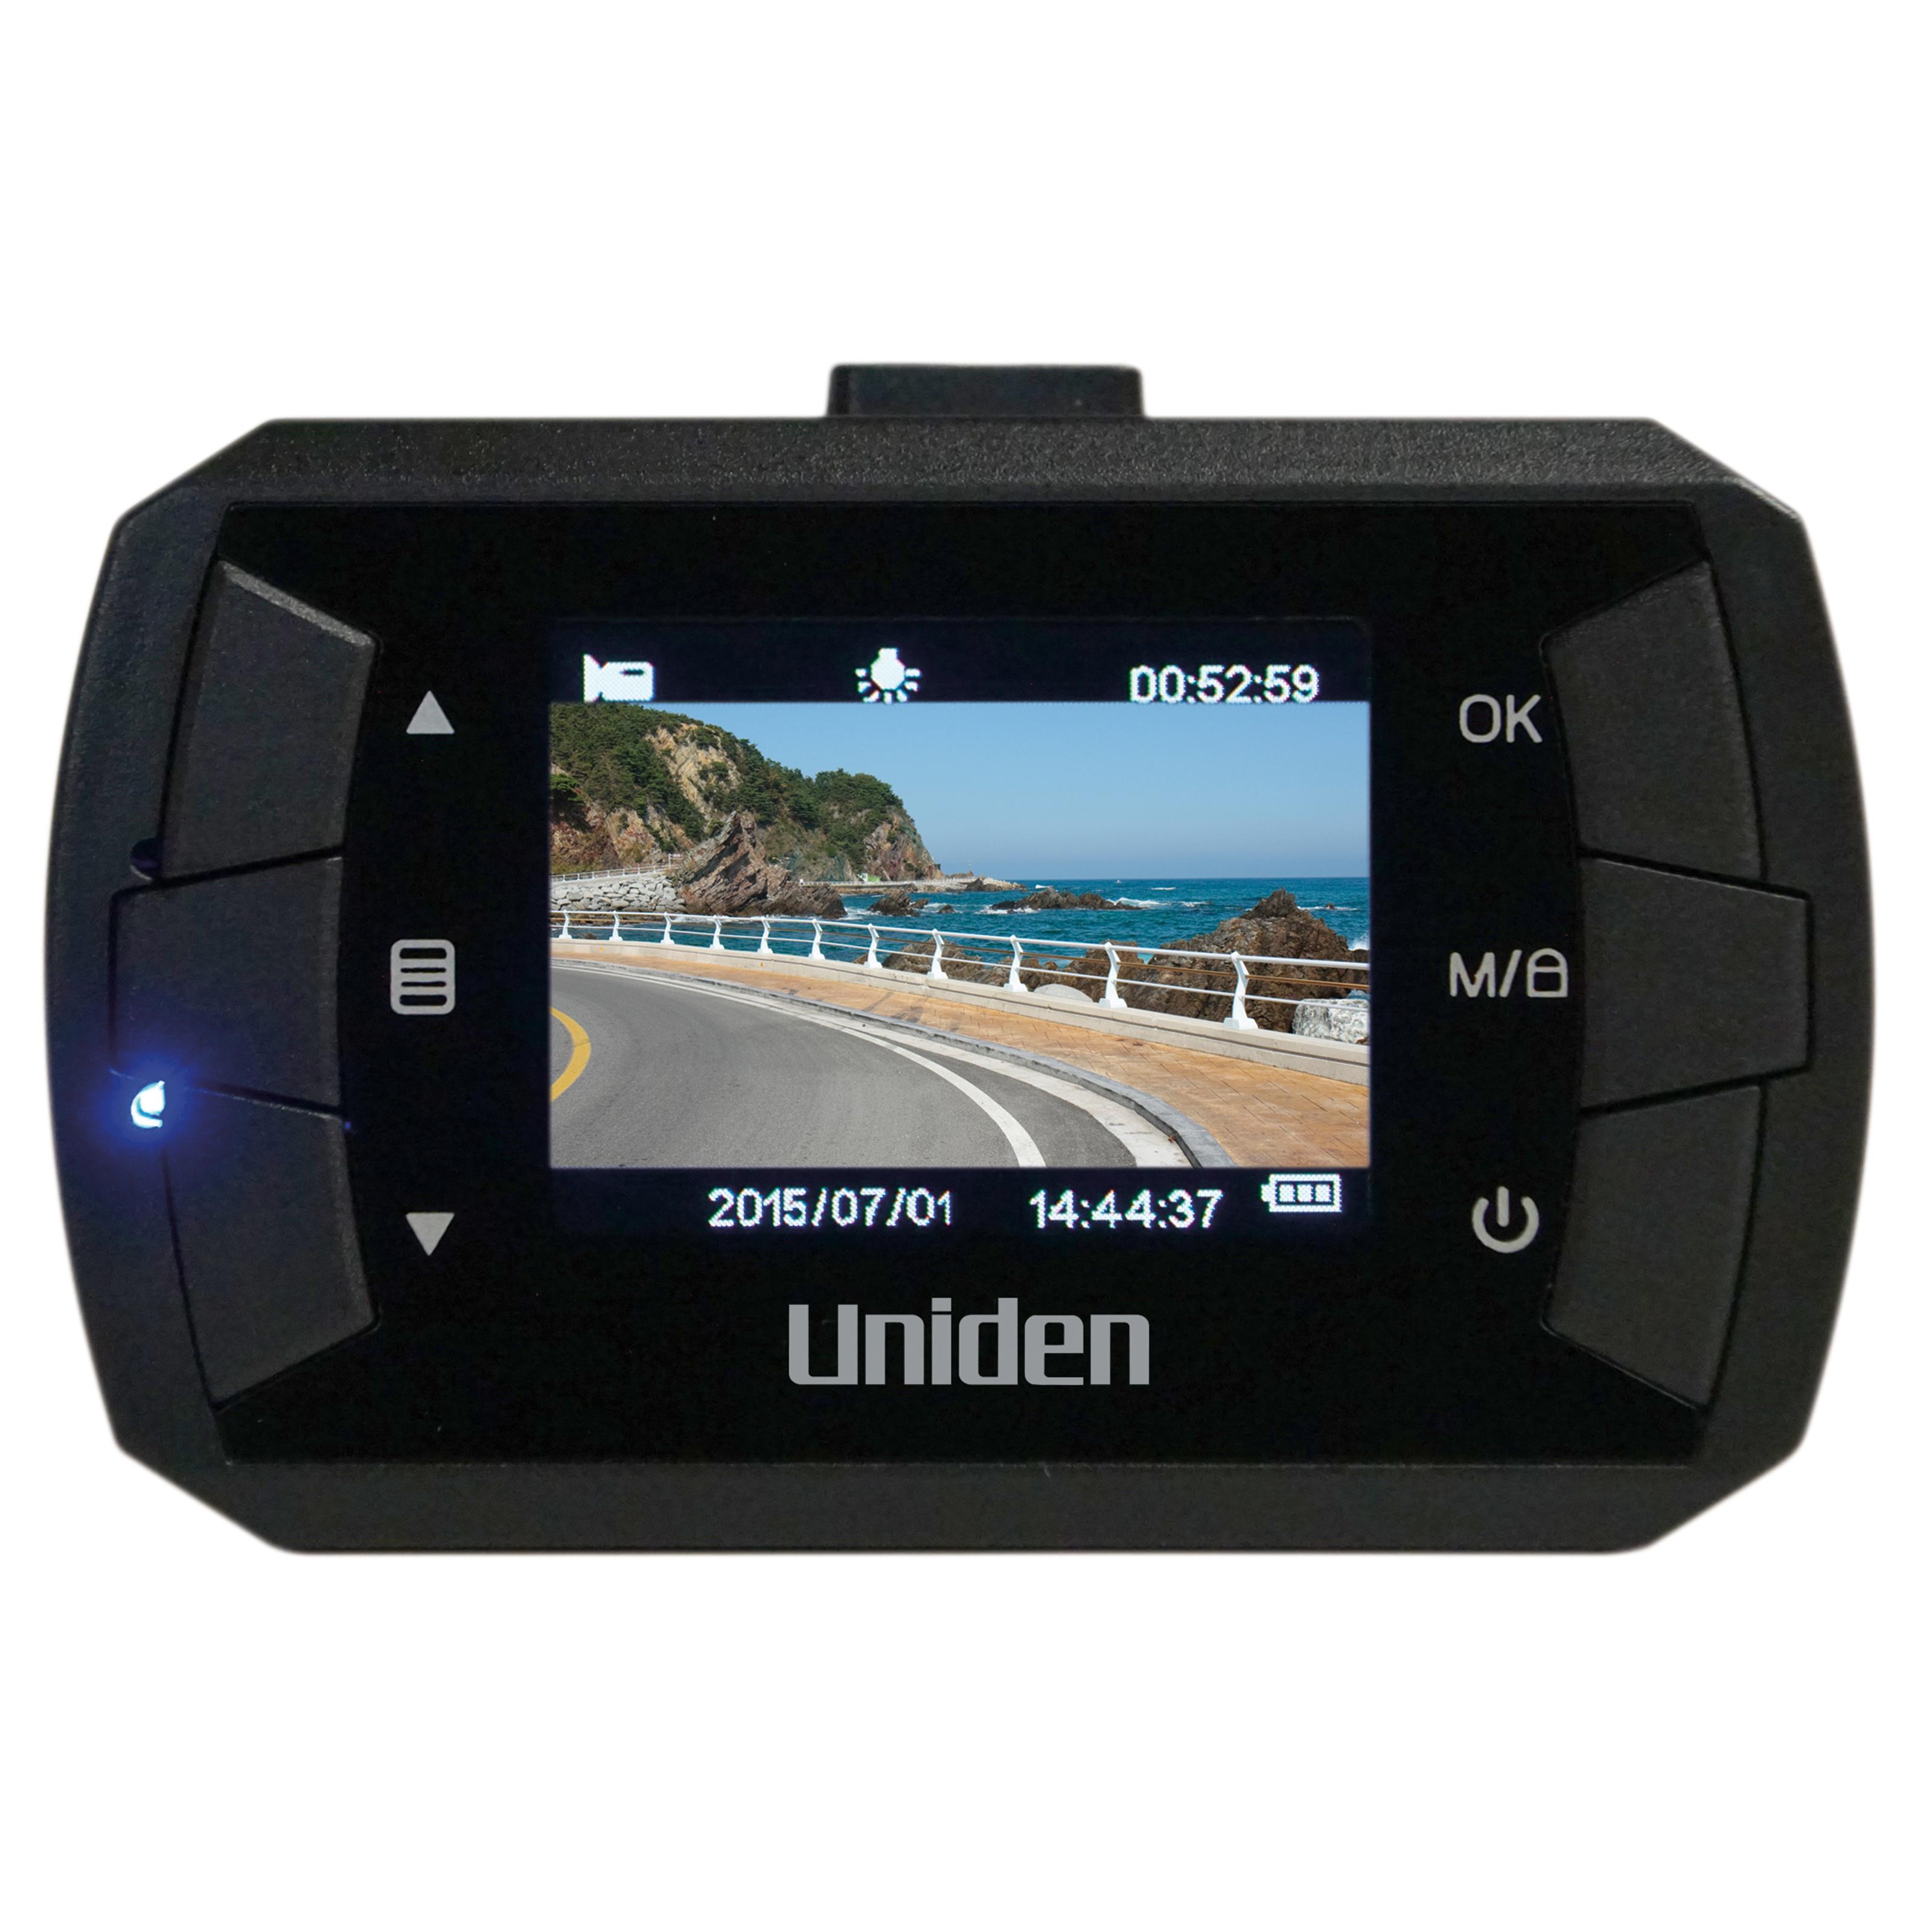 DC1 - Uniden Dash Camera Full HD